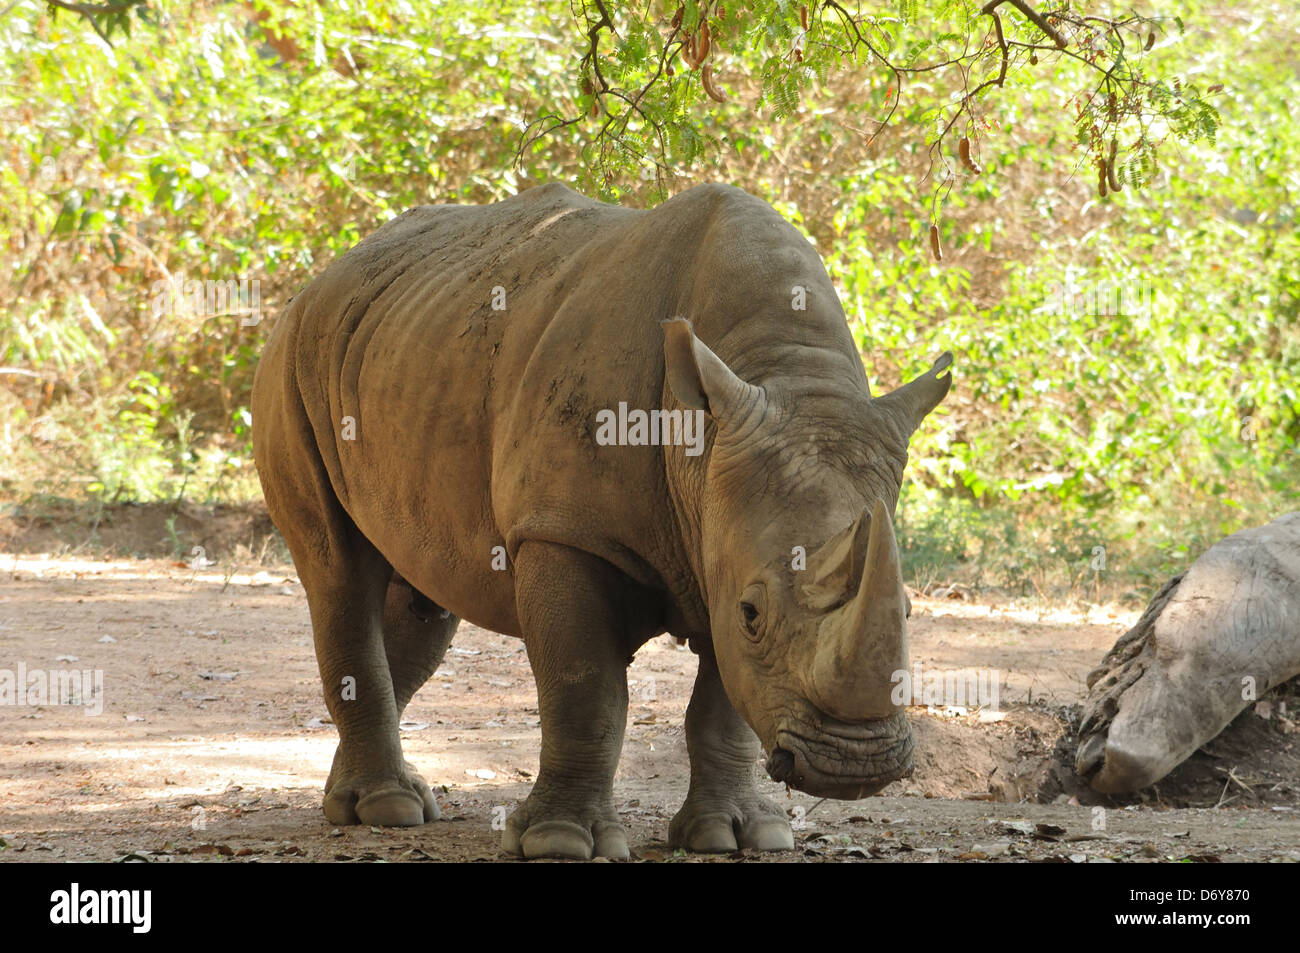 Indian Rhinoceros ( Rhinoceros unicornis ) - Stock Image